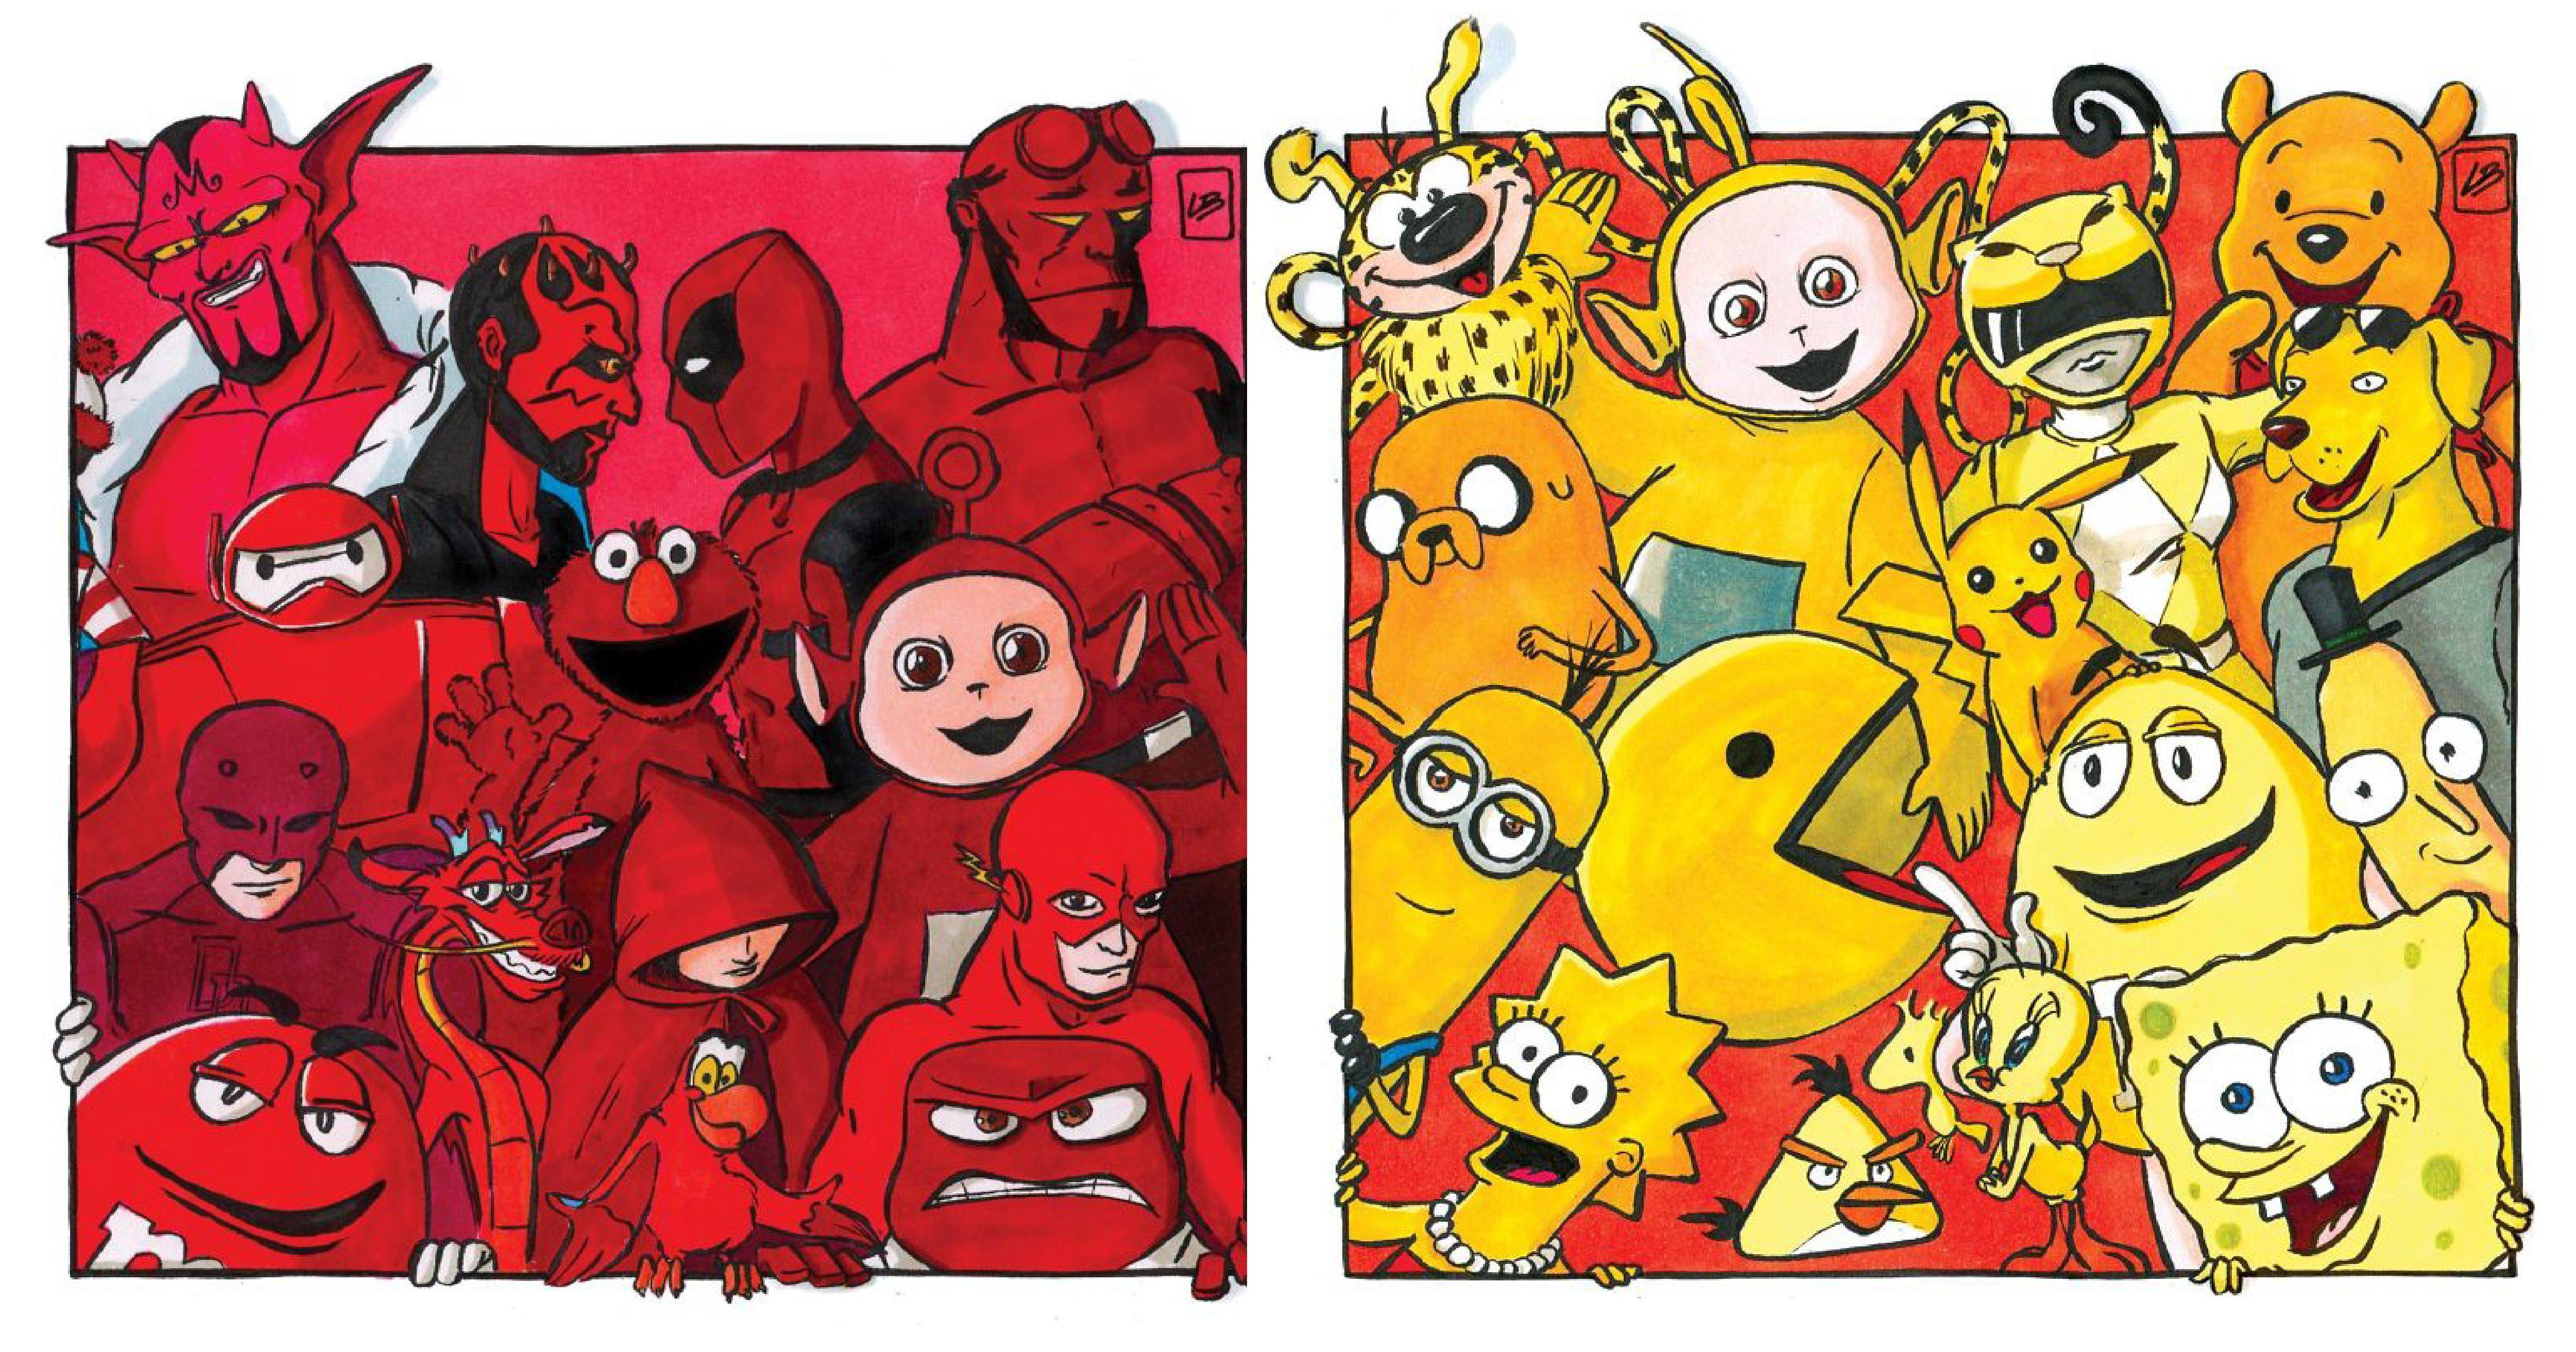 e5b081e99da2 2 1.png?resize=648,365 - 法國插畫家超有才!用顏色分類各大動漫角色 ... 看完後你想加入哪支超級戰隊?